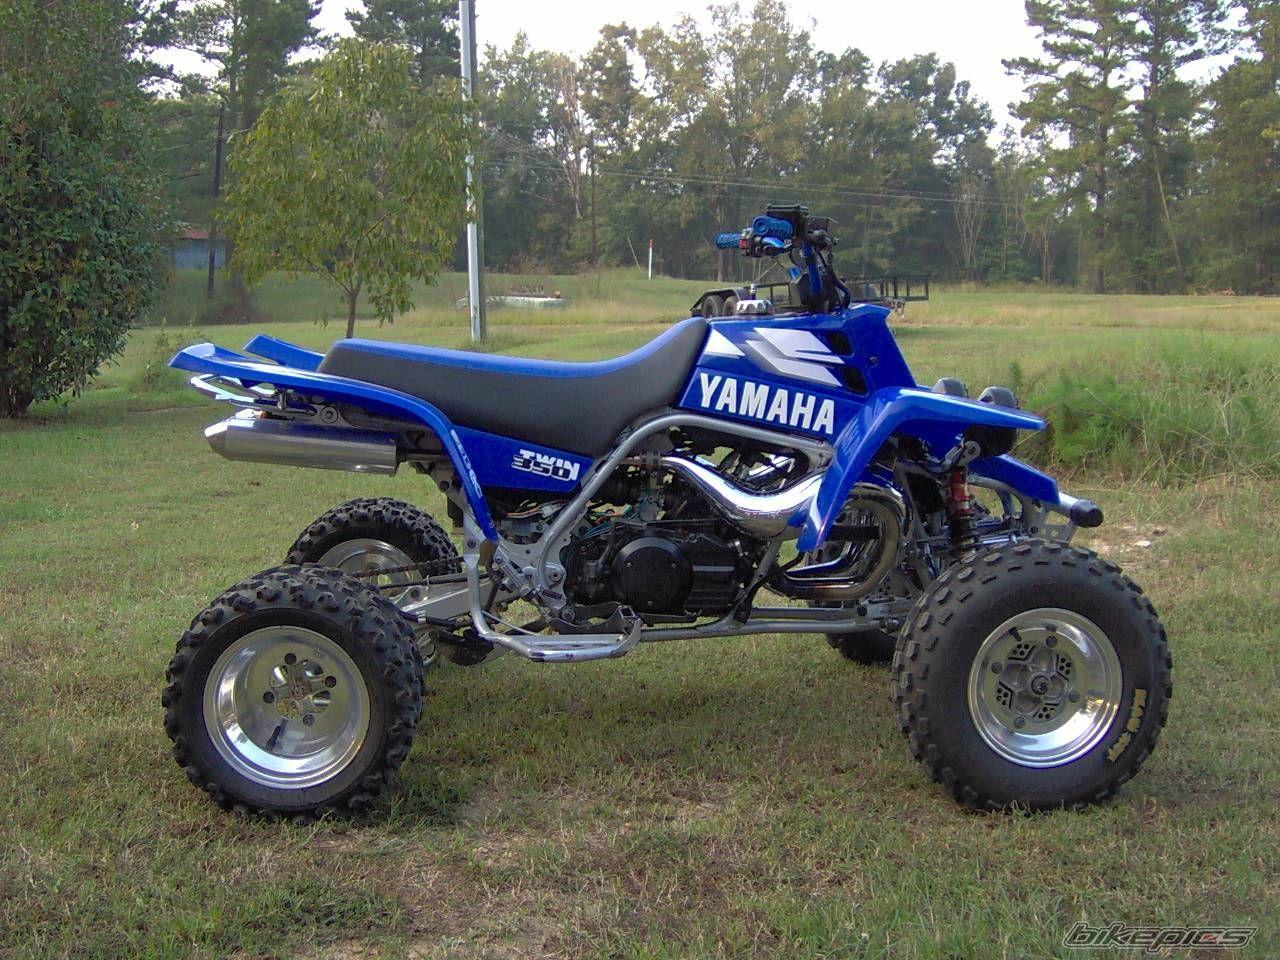 2000 Yamaha Banshee Wiring Diagram Soldering Neutrik Bikepics Off Road Pinterest